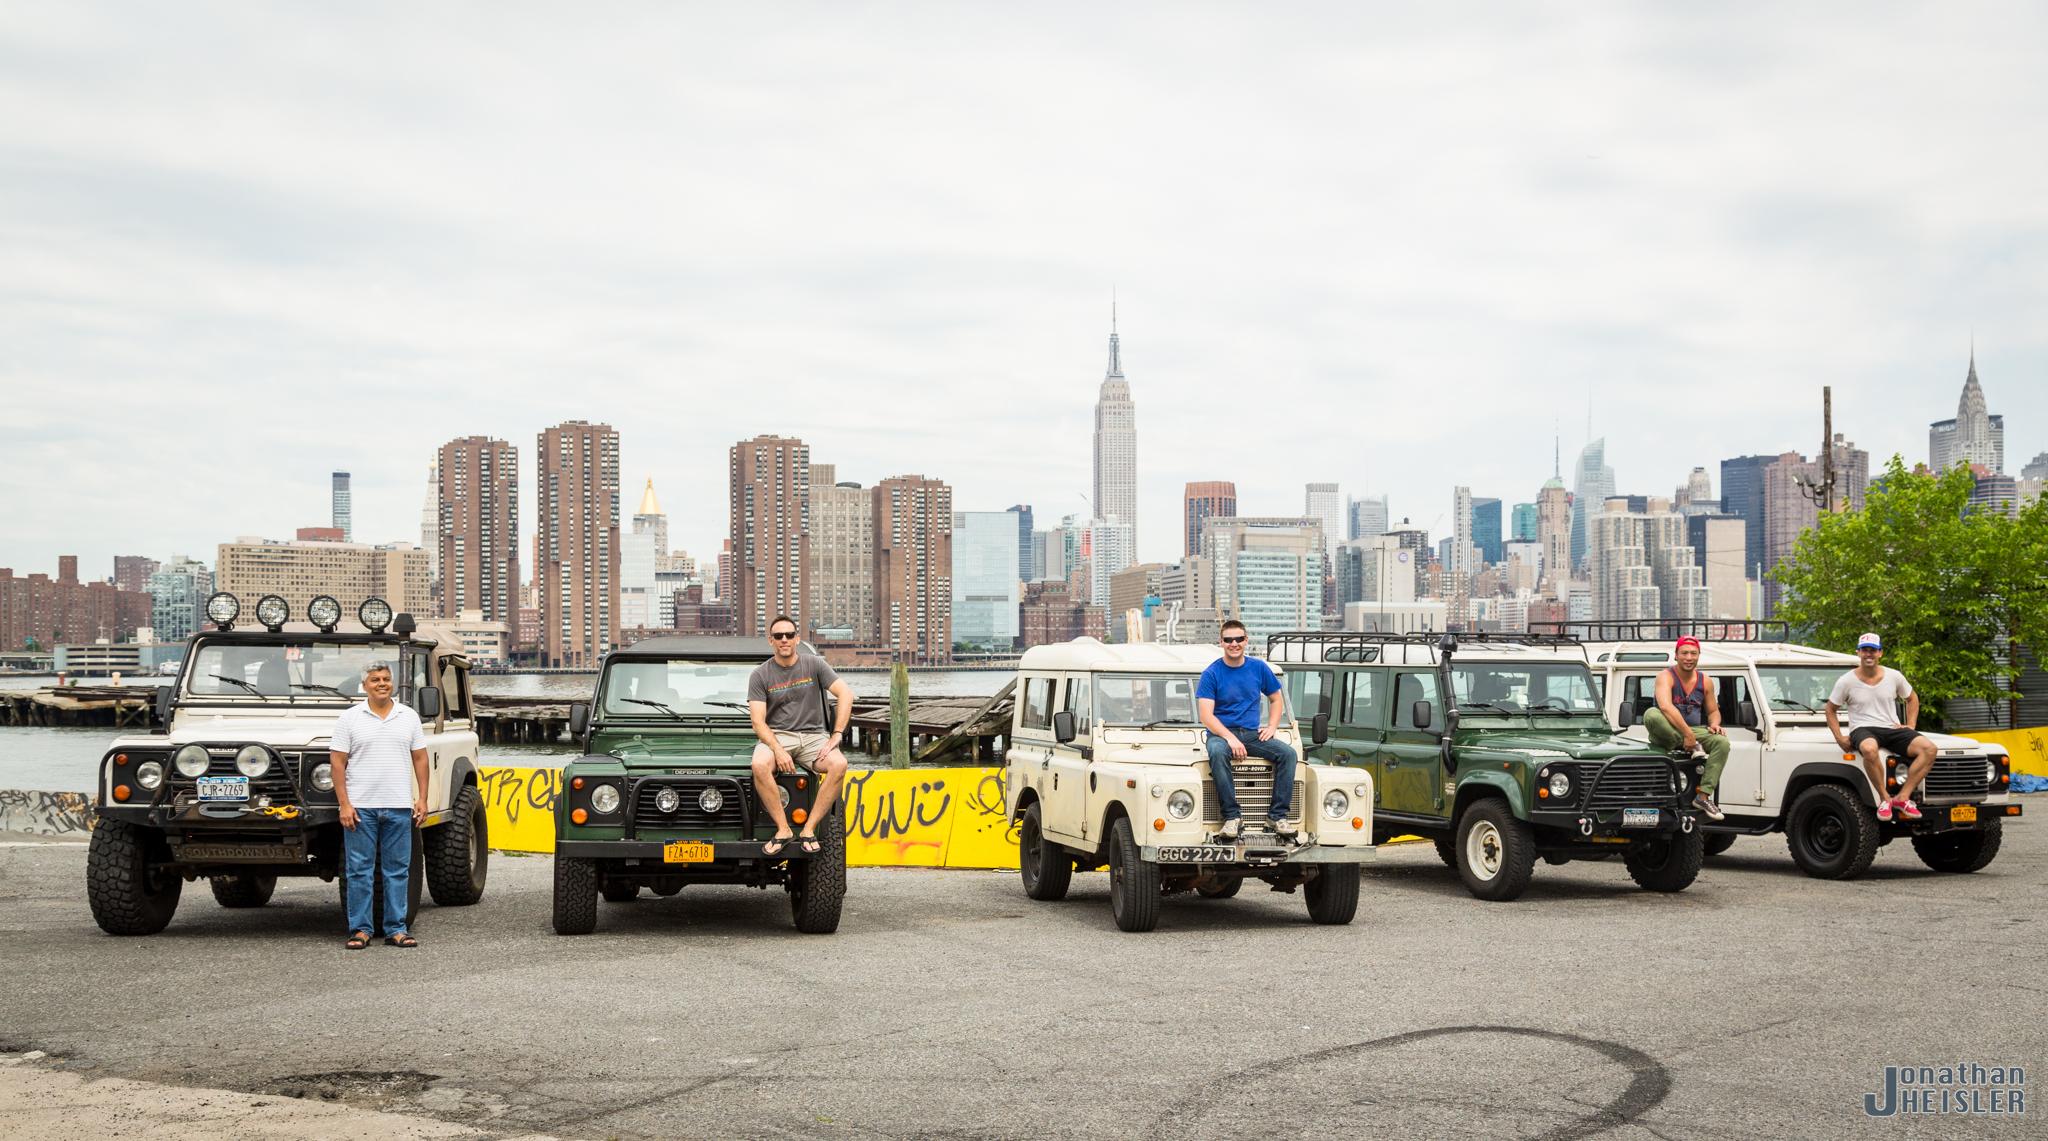 6-22-2014 _ Land Rover Defender  _  New York City00025.jpg